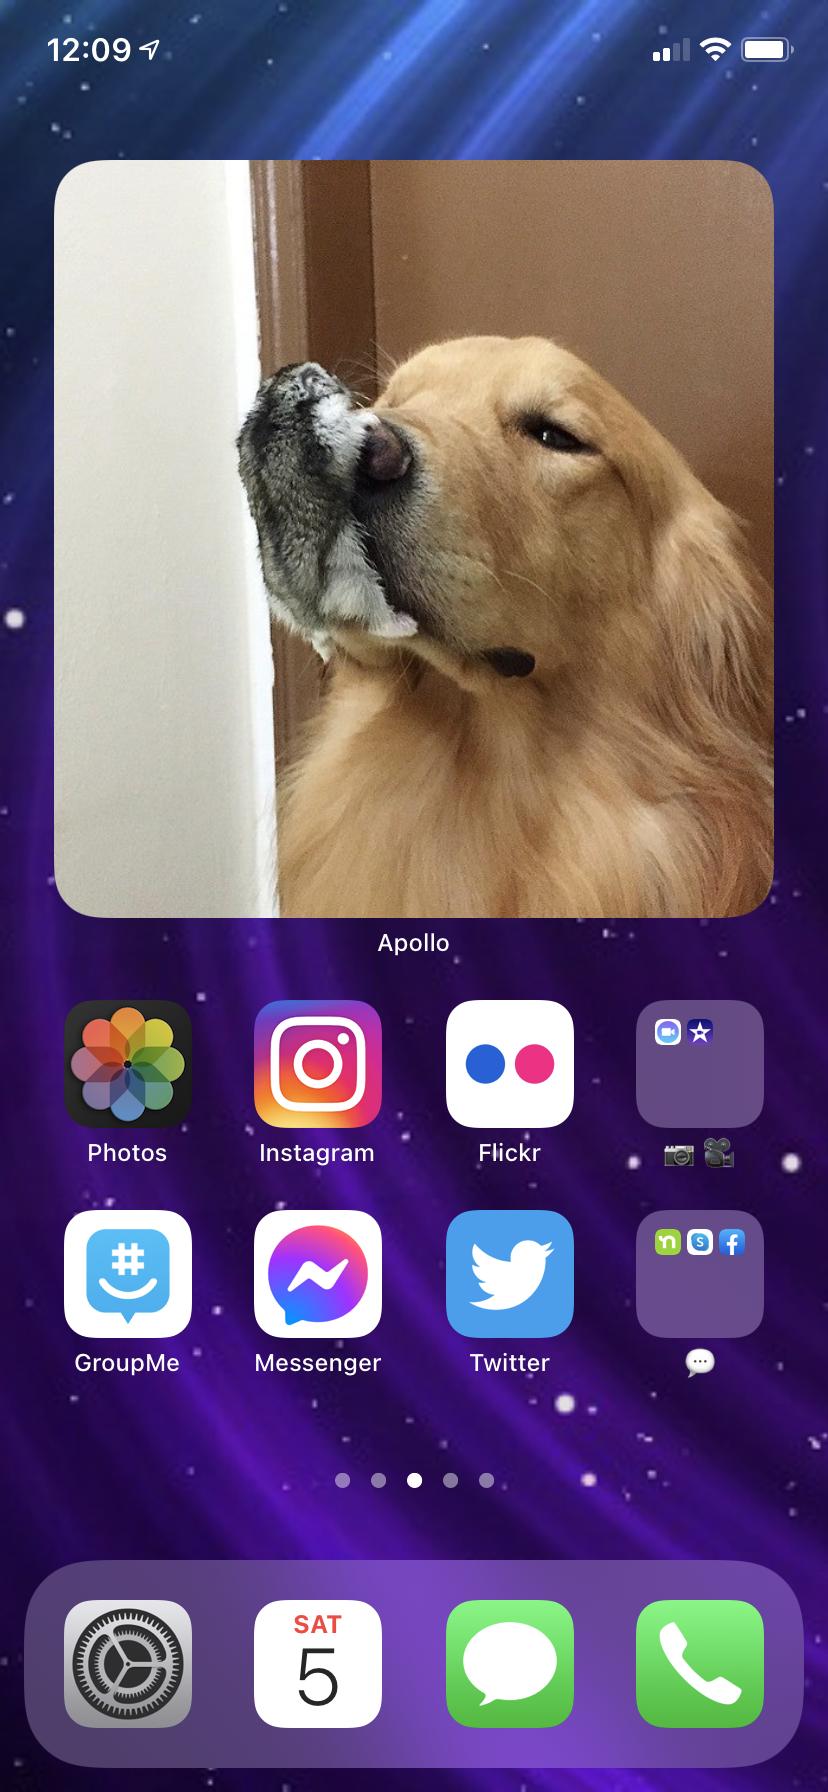 IMAGE(https://i.ibb.co/NjVtKgz/Apollo-Widget.png)